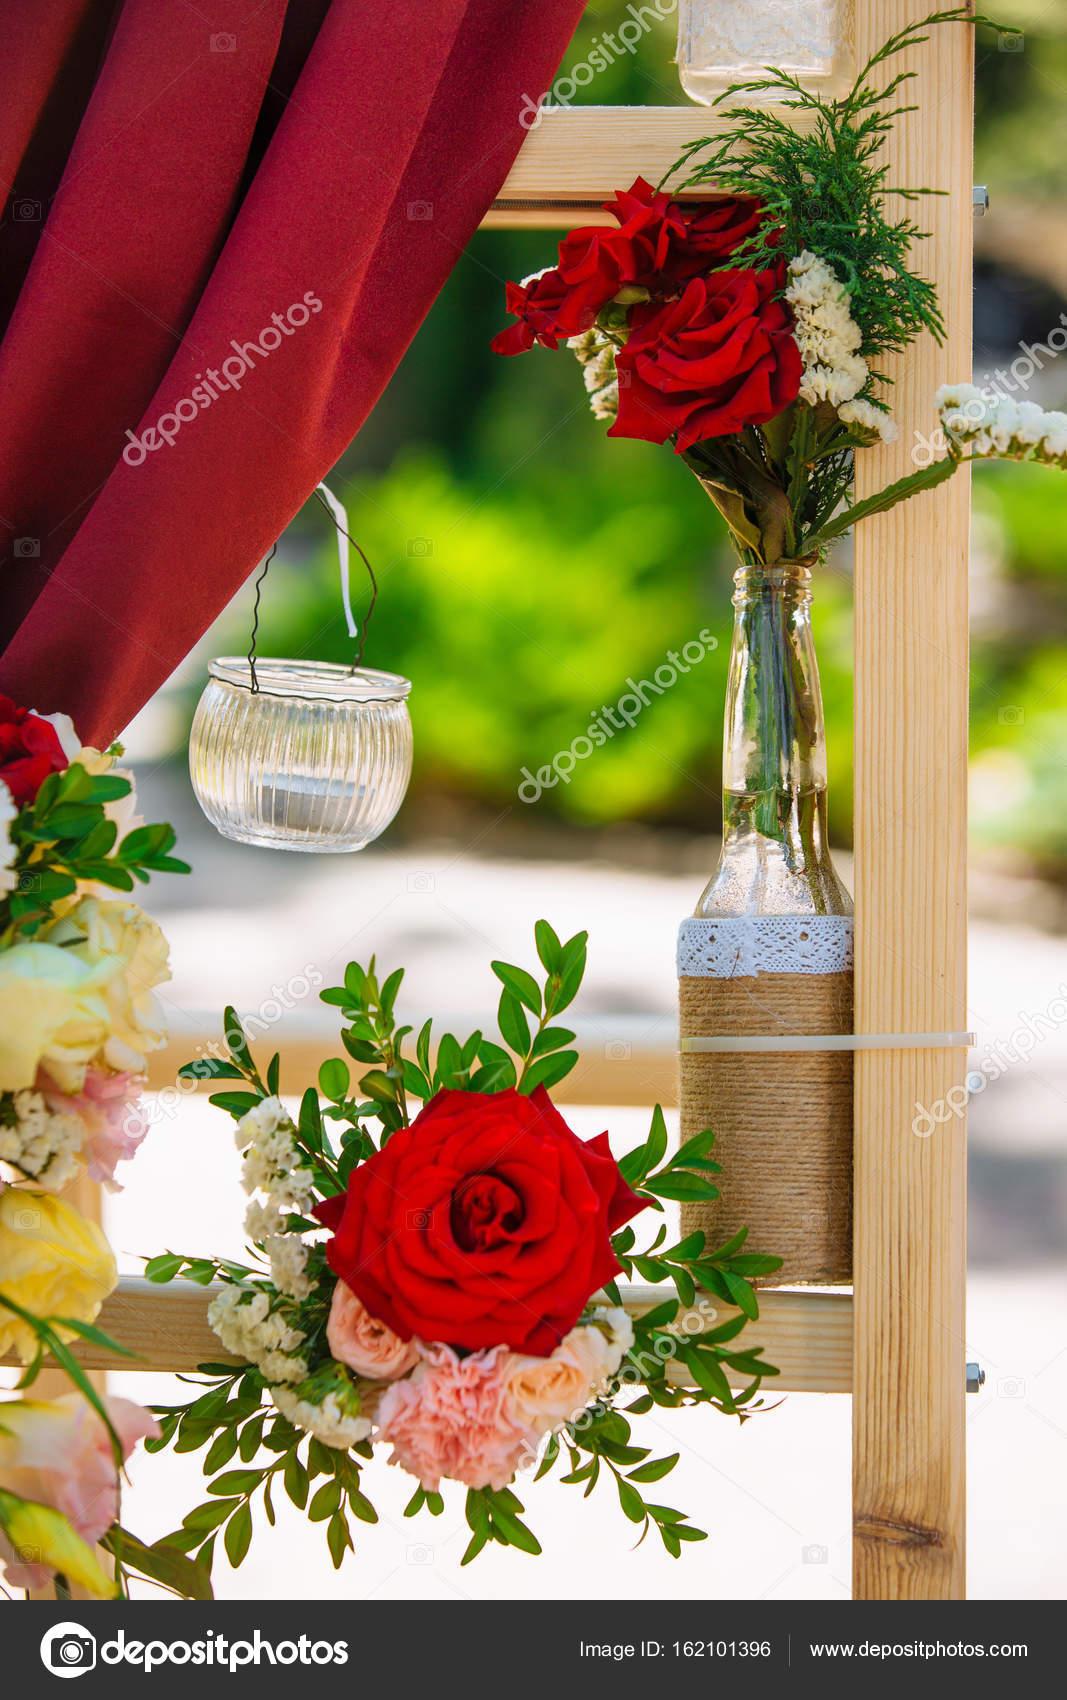 c74d31e79a1a Διακοσμήσεις γάμου. Πανηγυρική τελετή. Γάμος αψίδα. Ντεκόρ. Λεπτομέρειες–  εικόνα αρχείου